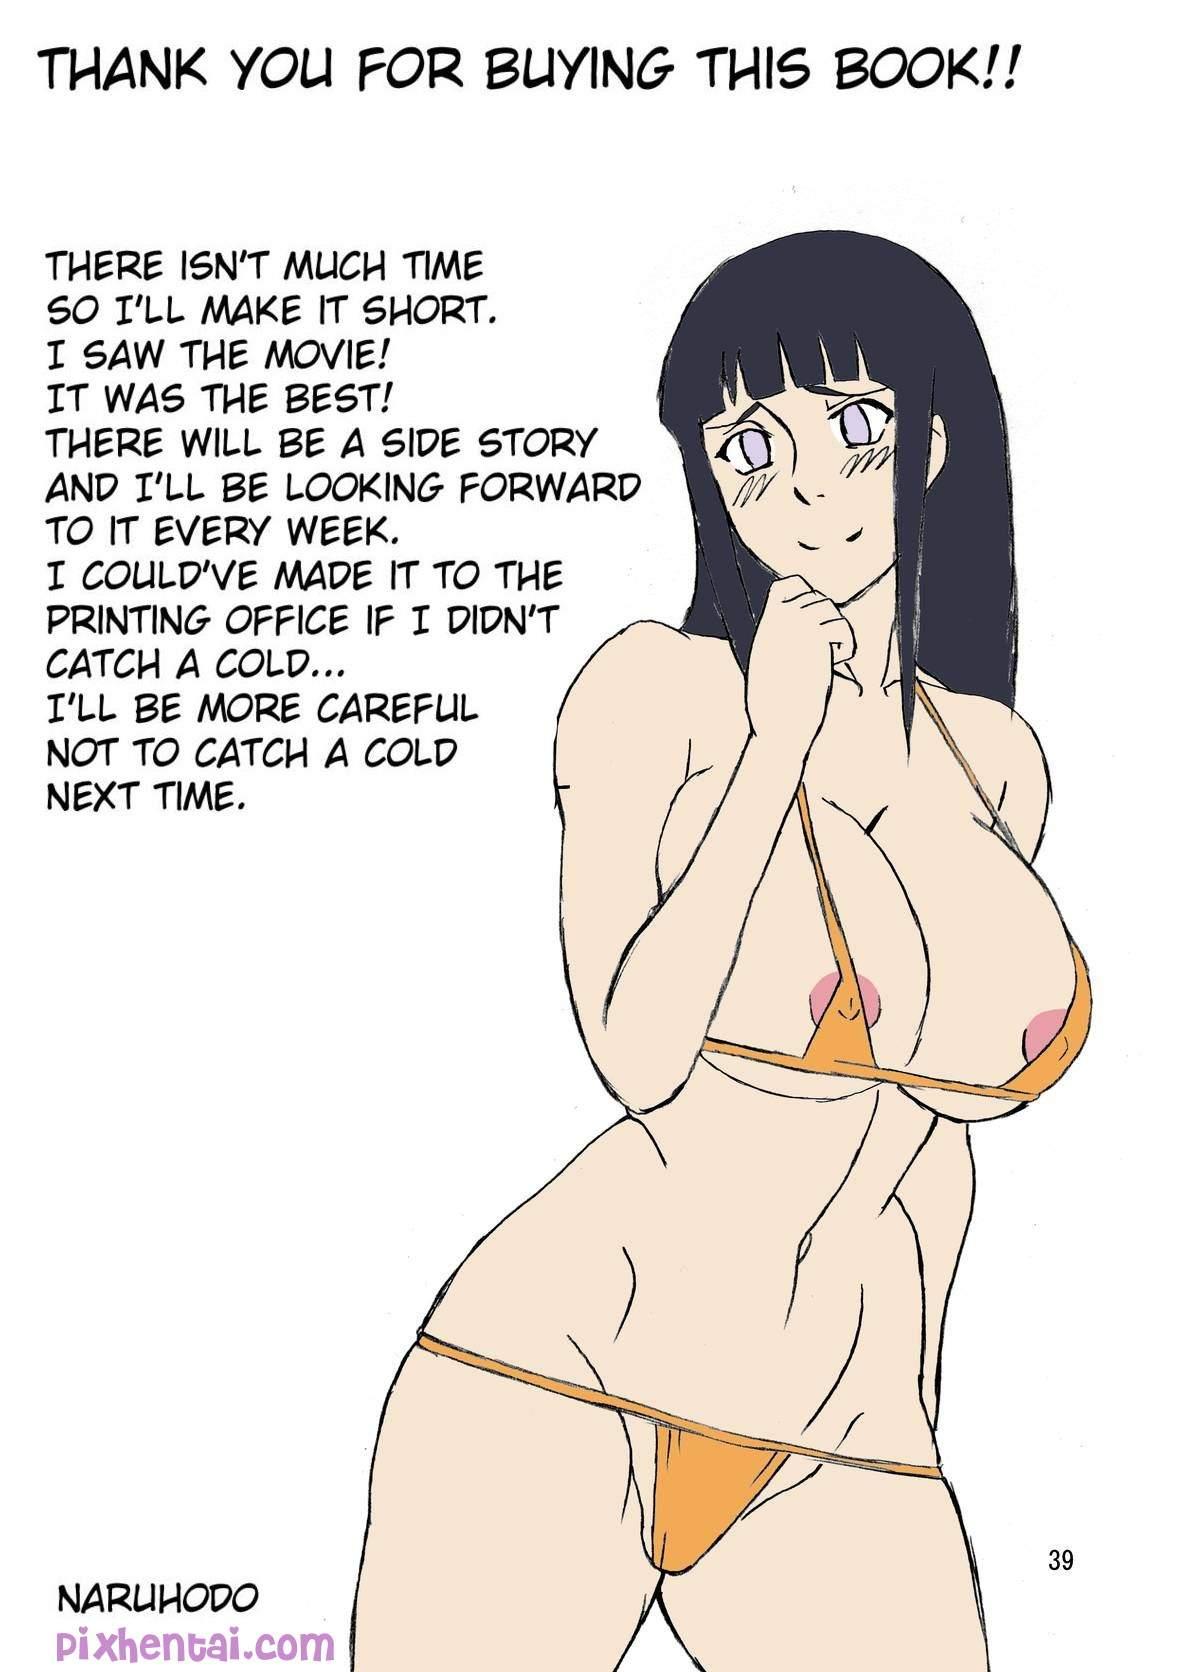 Komik hentai xxx manga sex bokep si mesum ekor sembilan berulah [naruto] 39